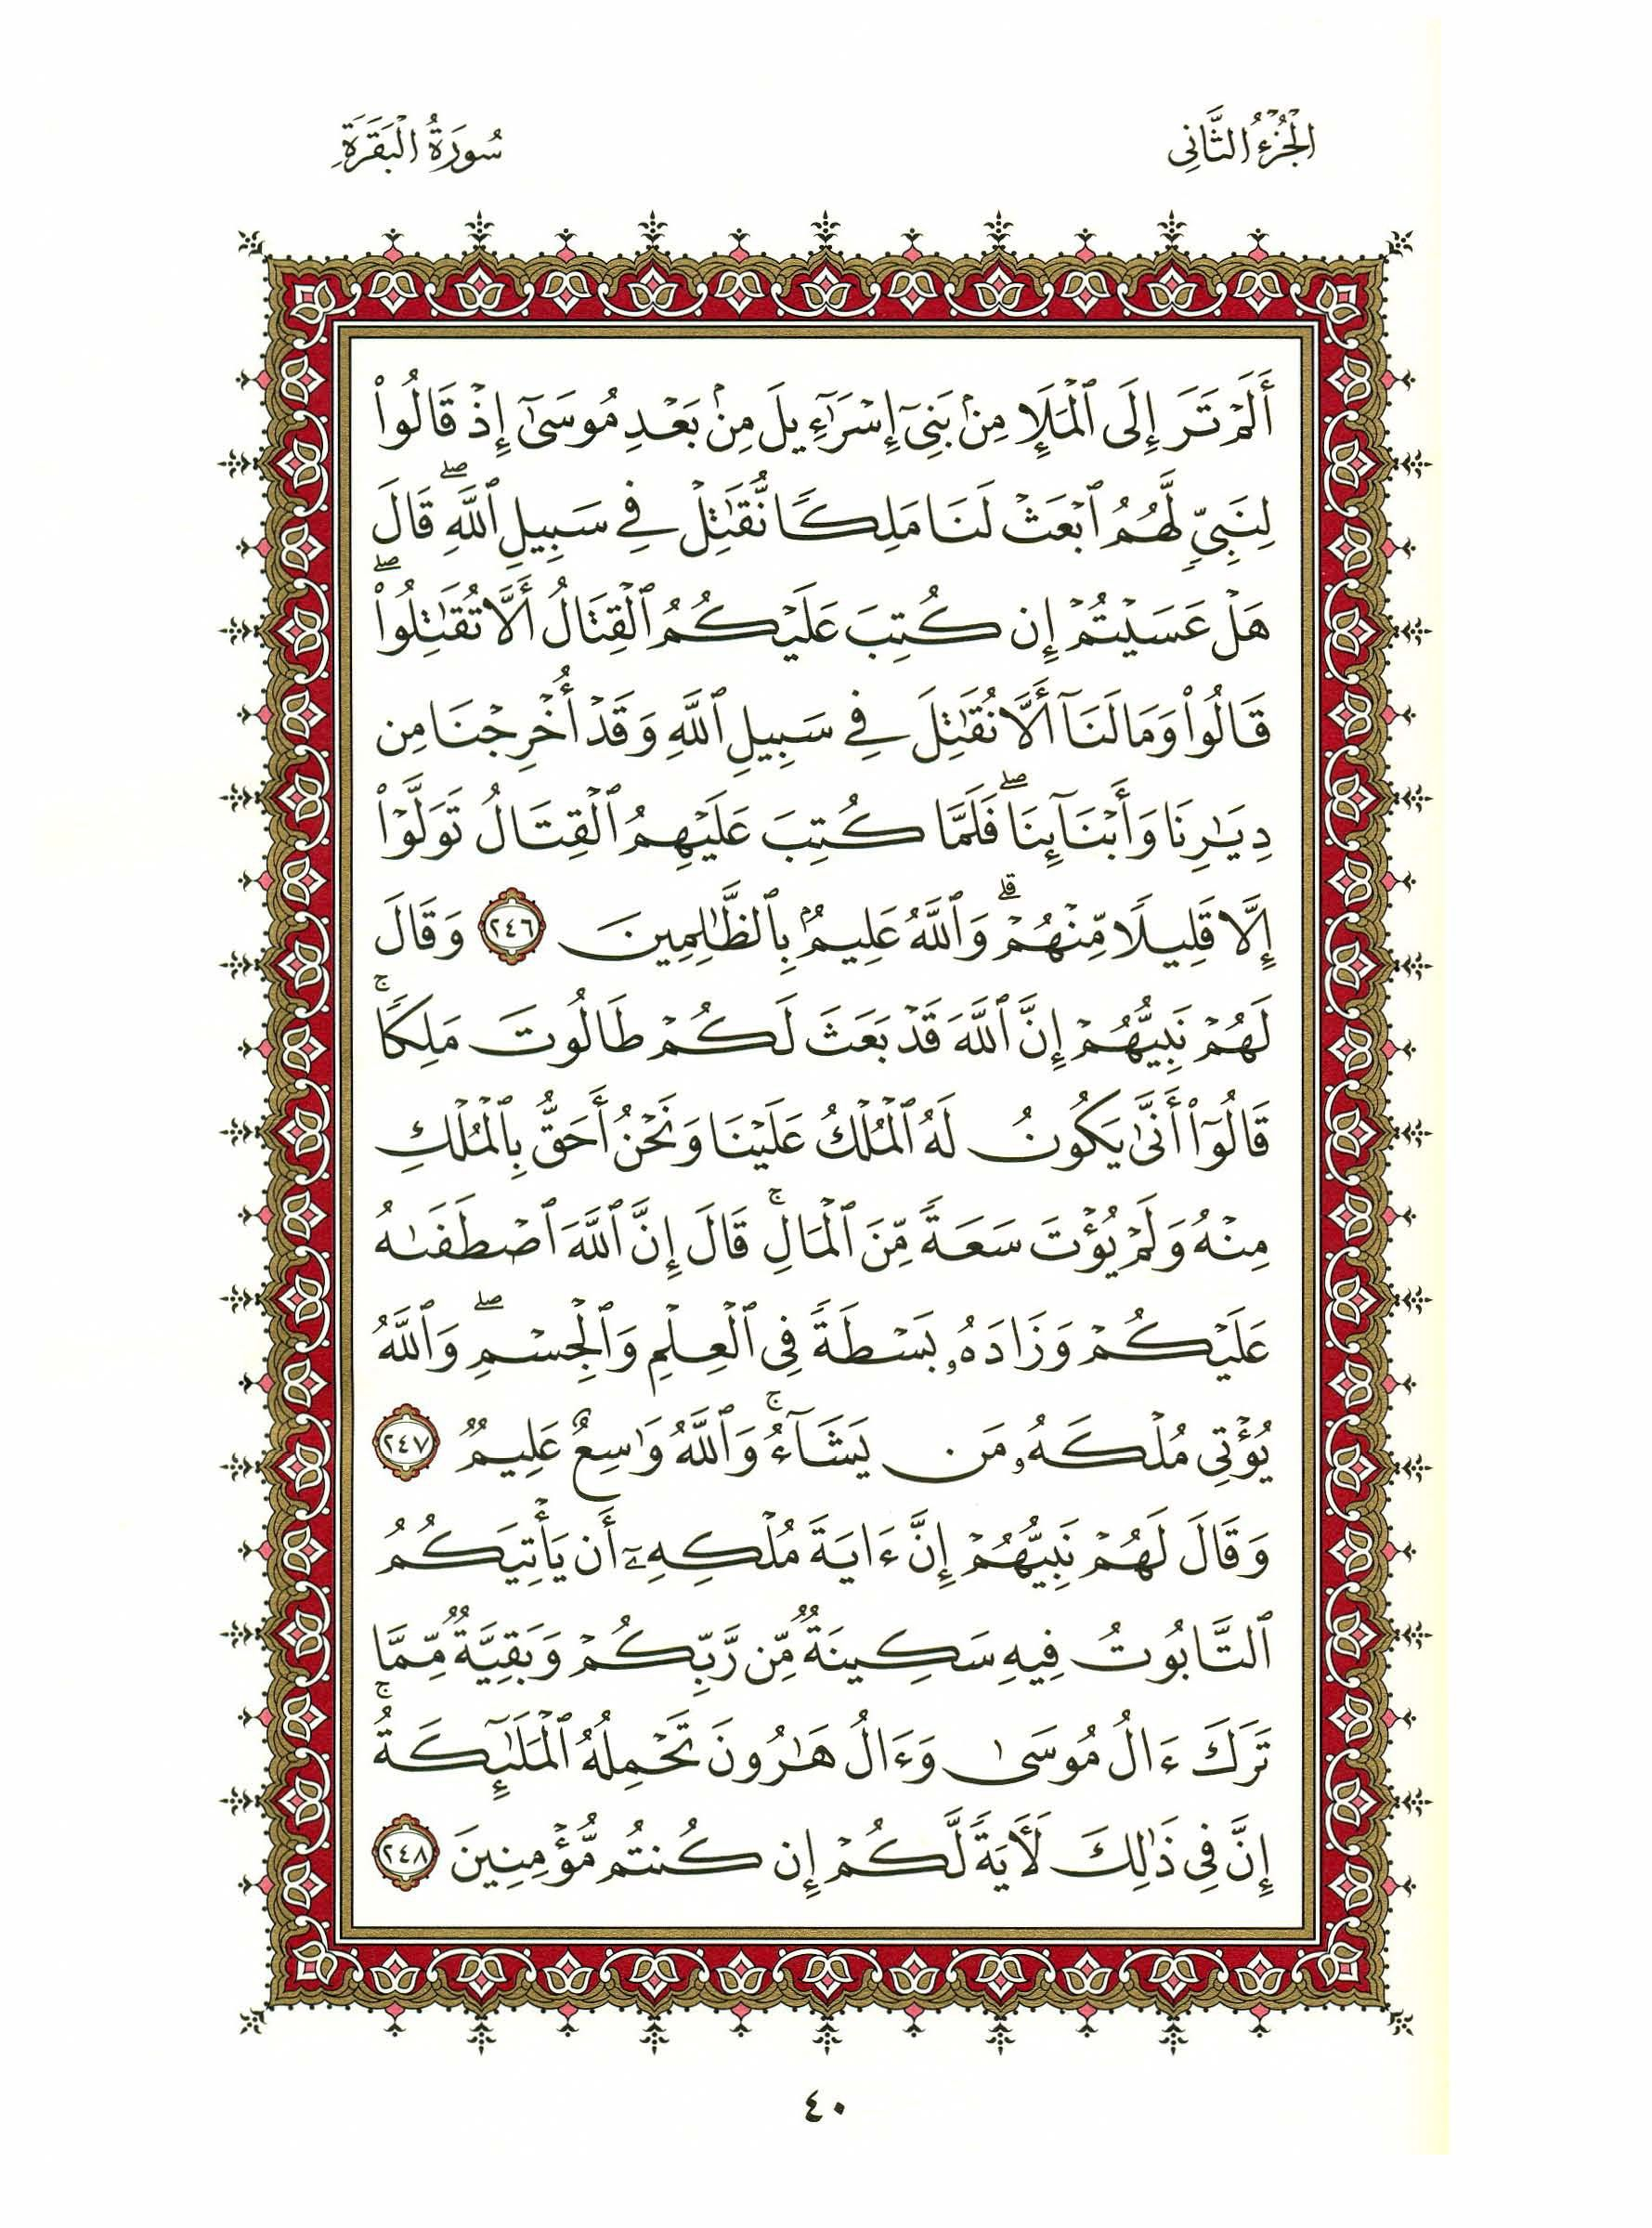 Pin By Heba Eid On القران الكريم مصحف قطر The Holy Quran Le Saint Coran Quran Verses Word Search Puzzle Verses